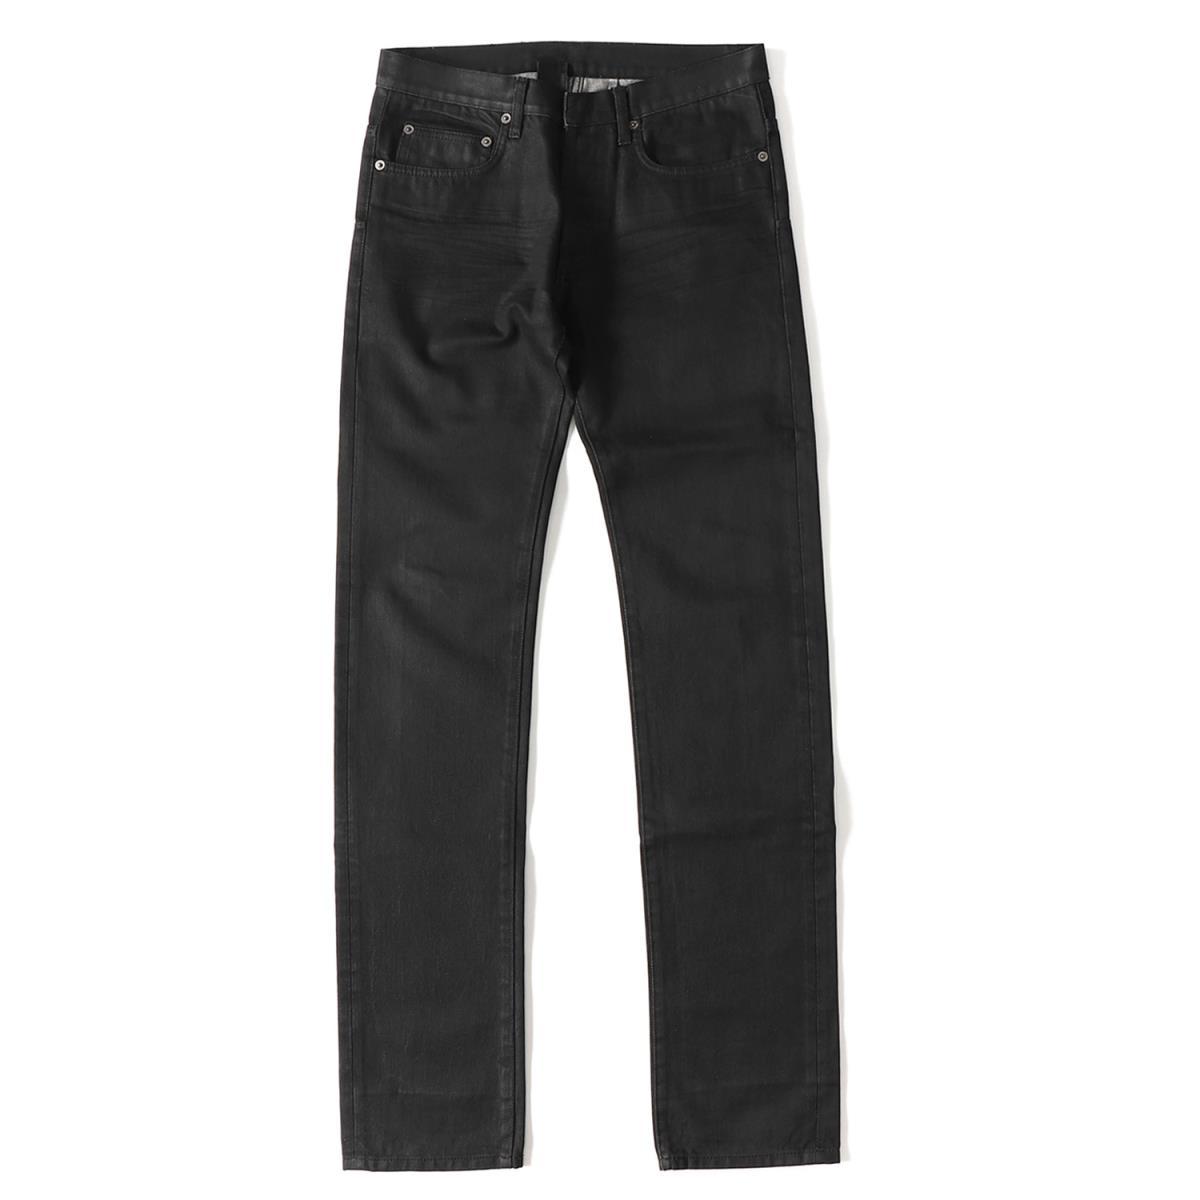 Dior HOMME (ディオールオム) 06A/W ラスターコーティング加工スリムデニムパンツ ブラック 29 【メンズ】【K2037】【中古】【あす楽☆対応可】